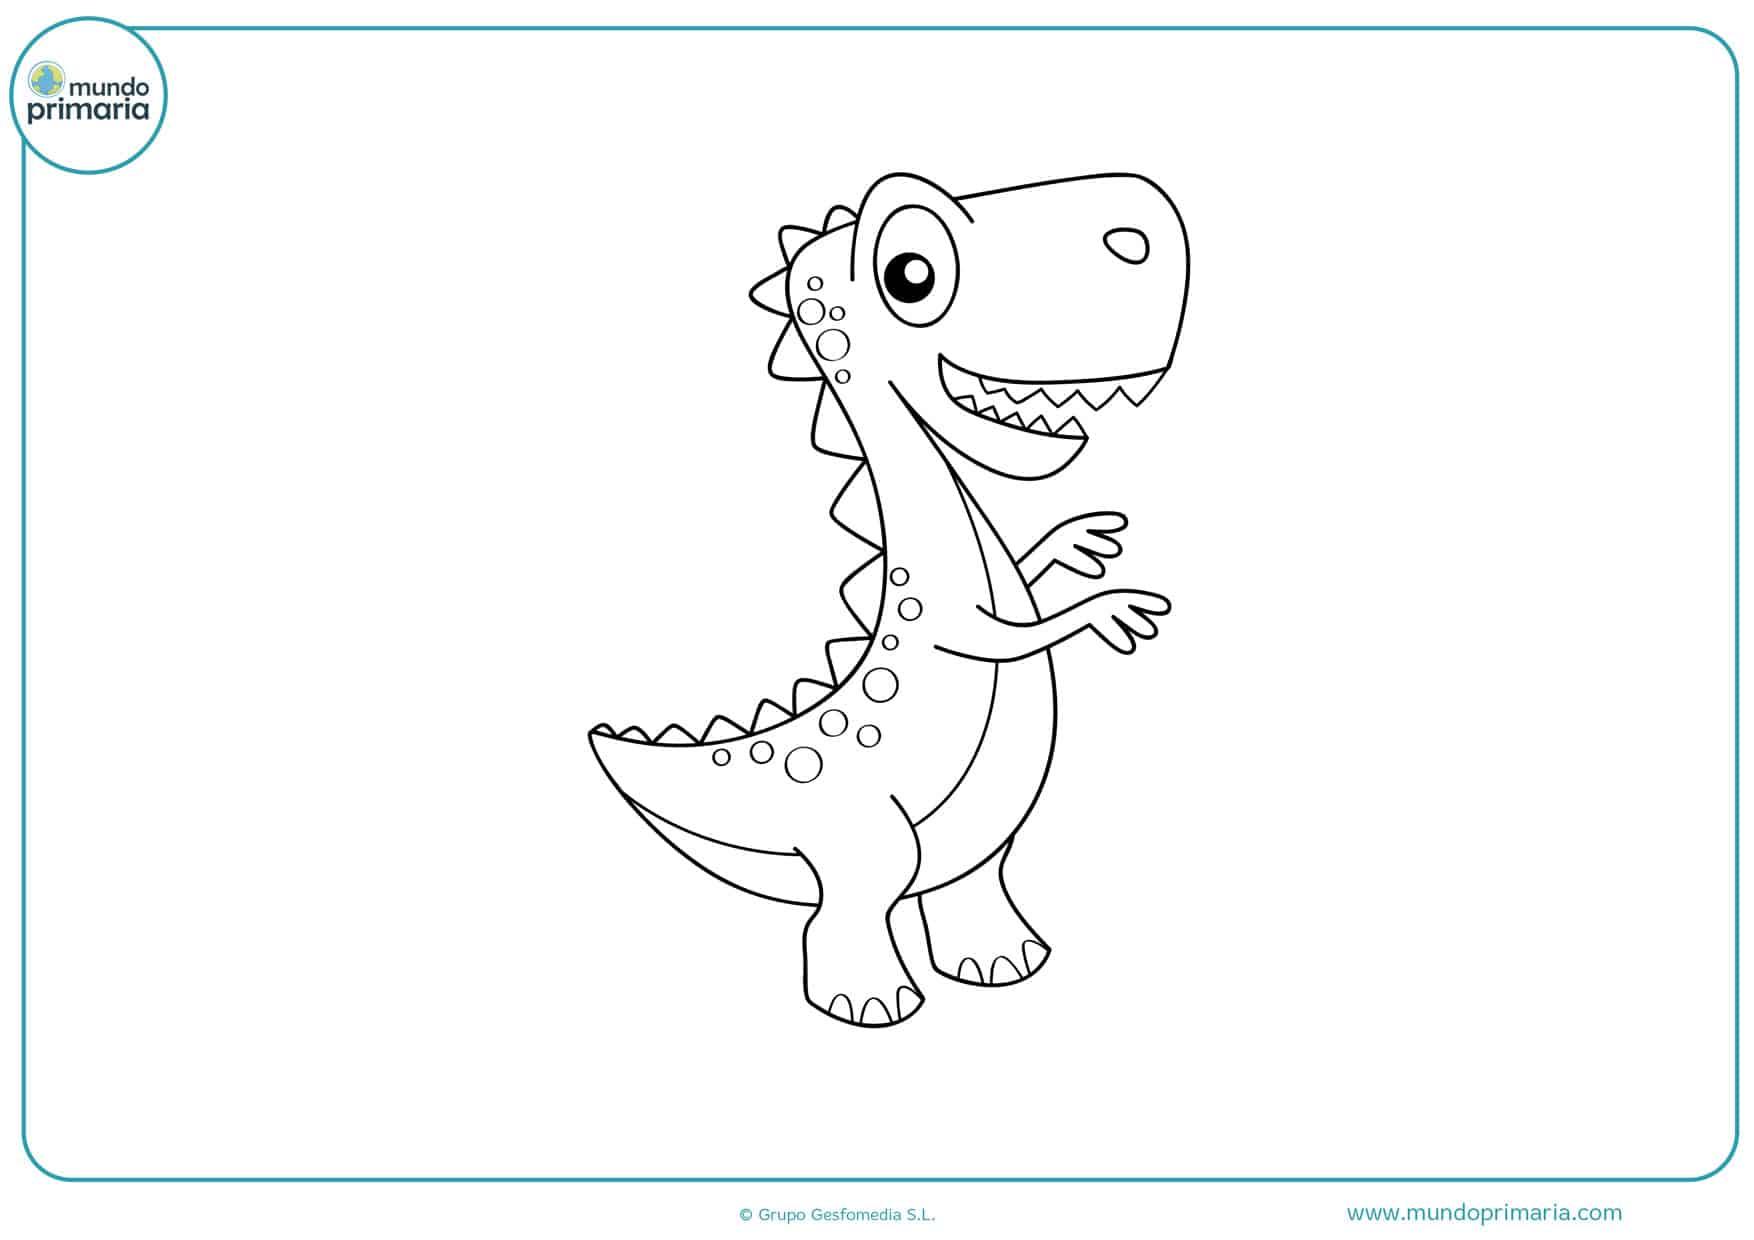 dibujos para colorear e imprimir gratis de dinosaurios